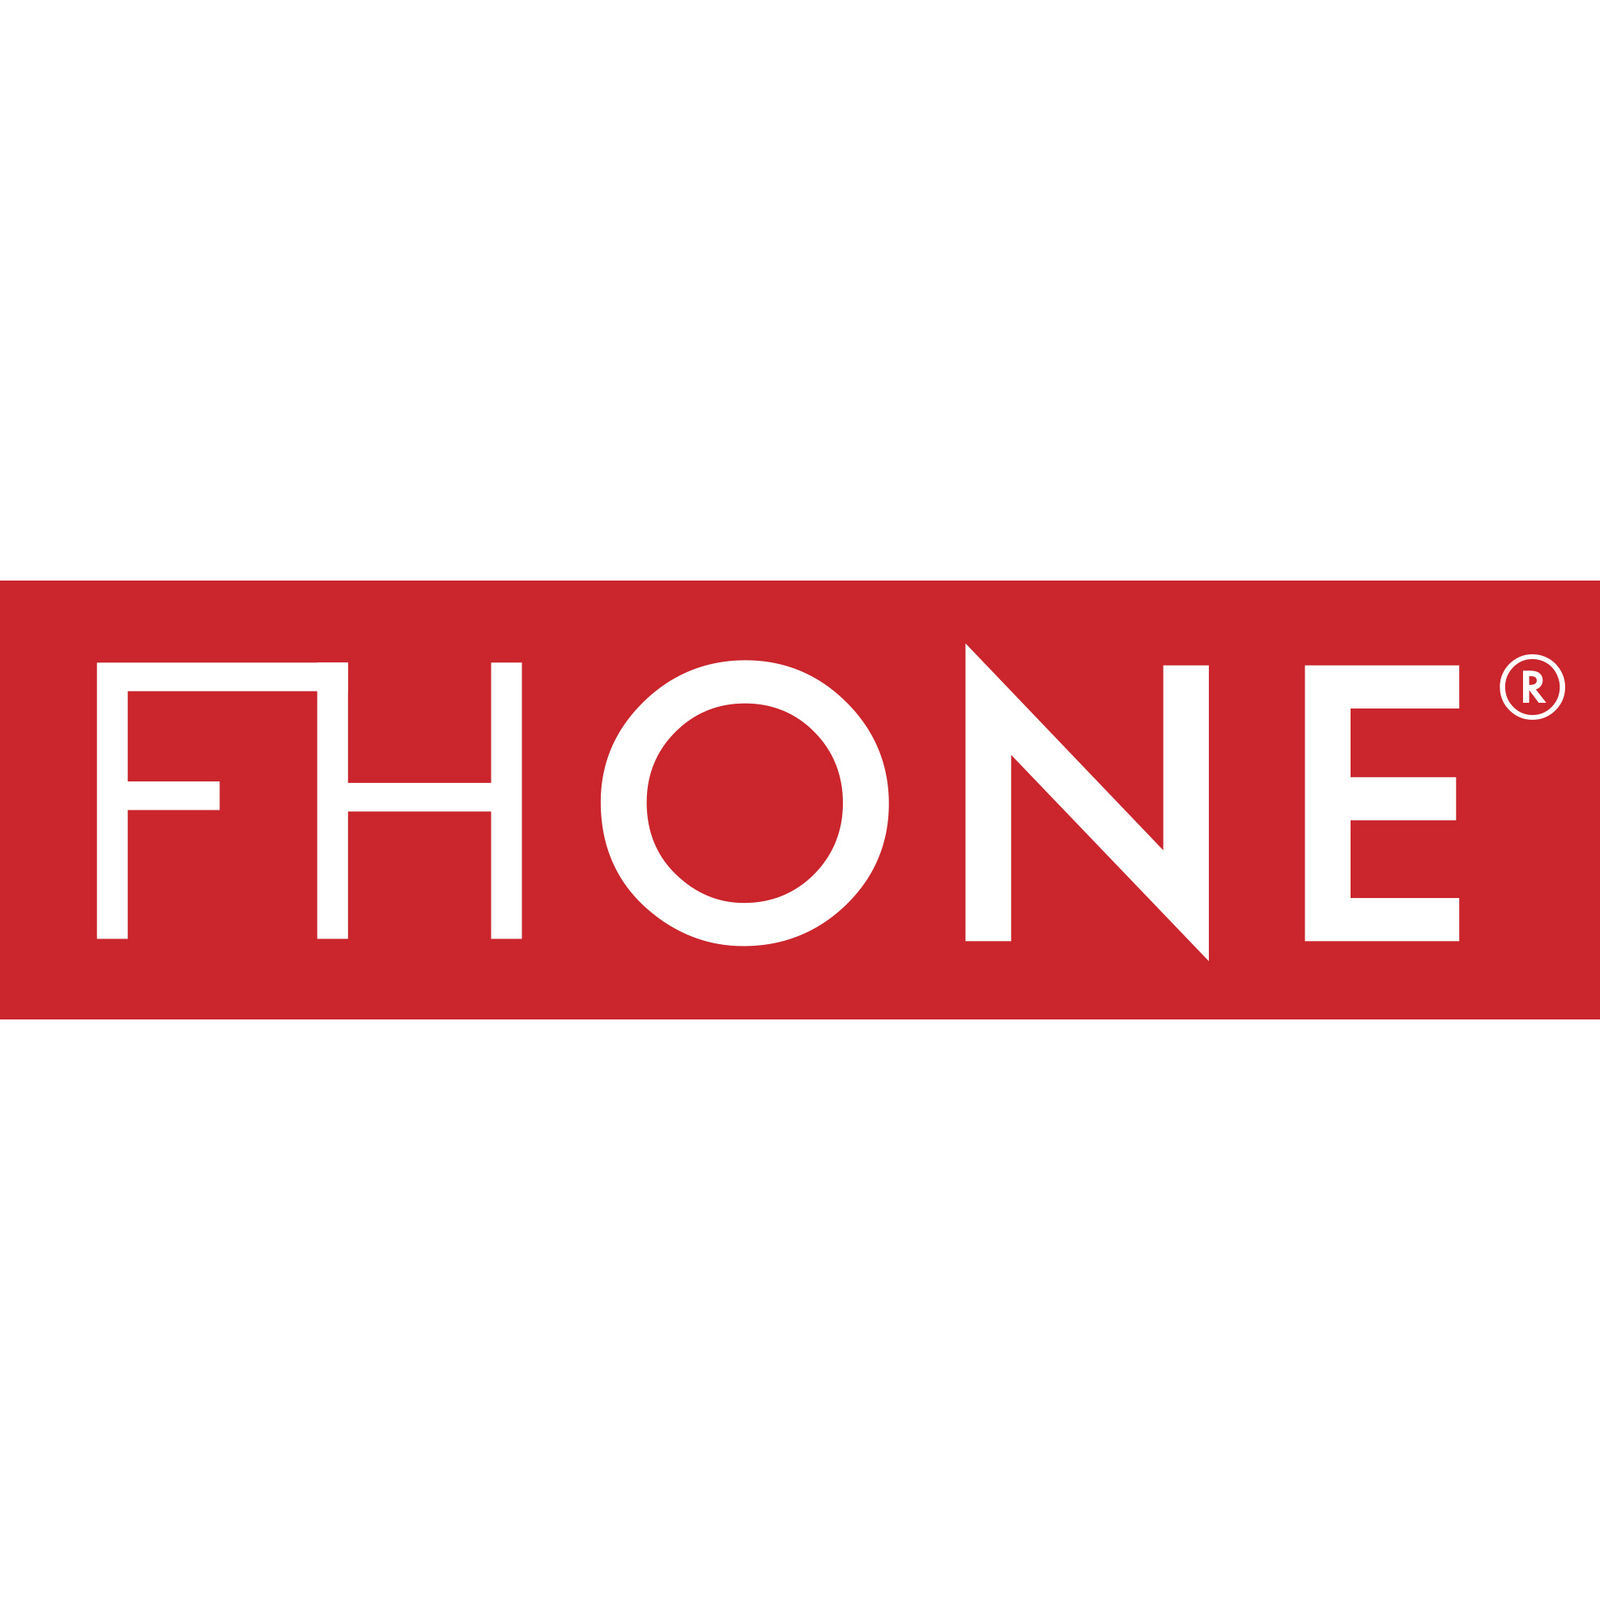 FHONE (Image 1)